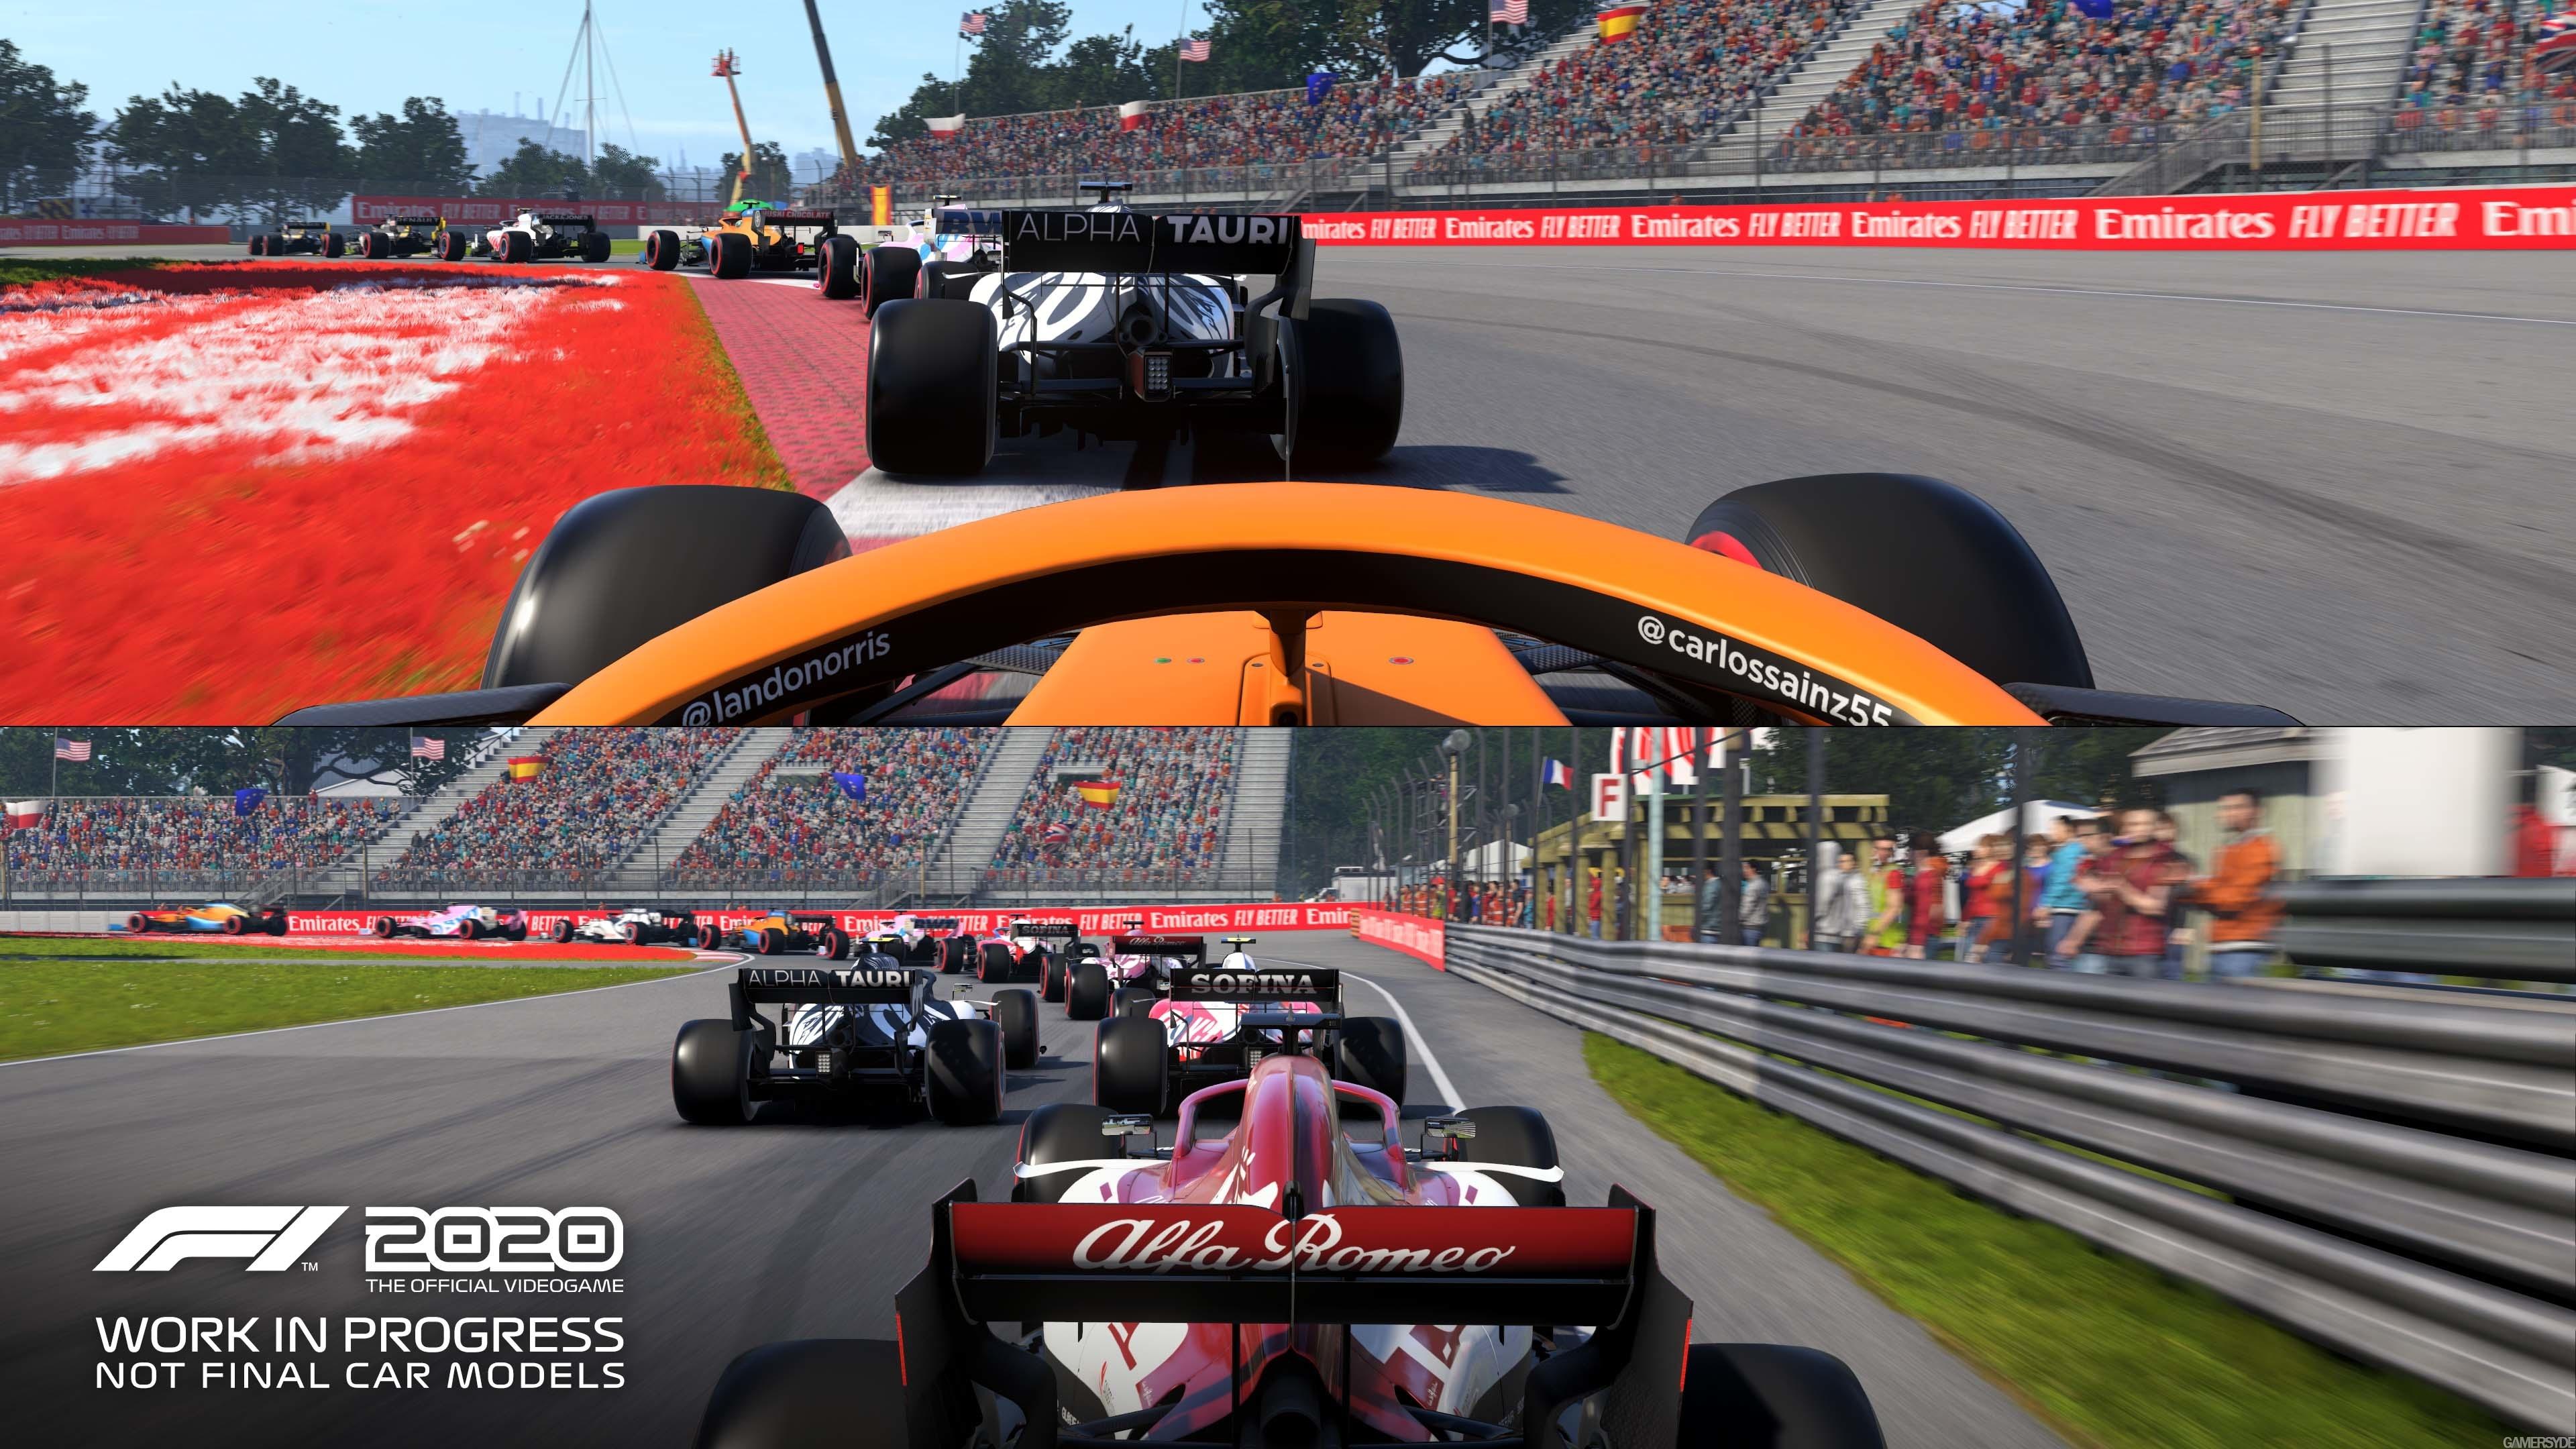 F1 2020 showcases split-screen gameplay - Gamersyde